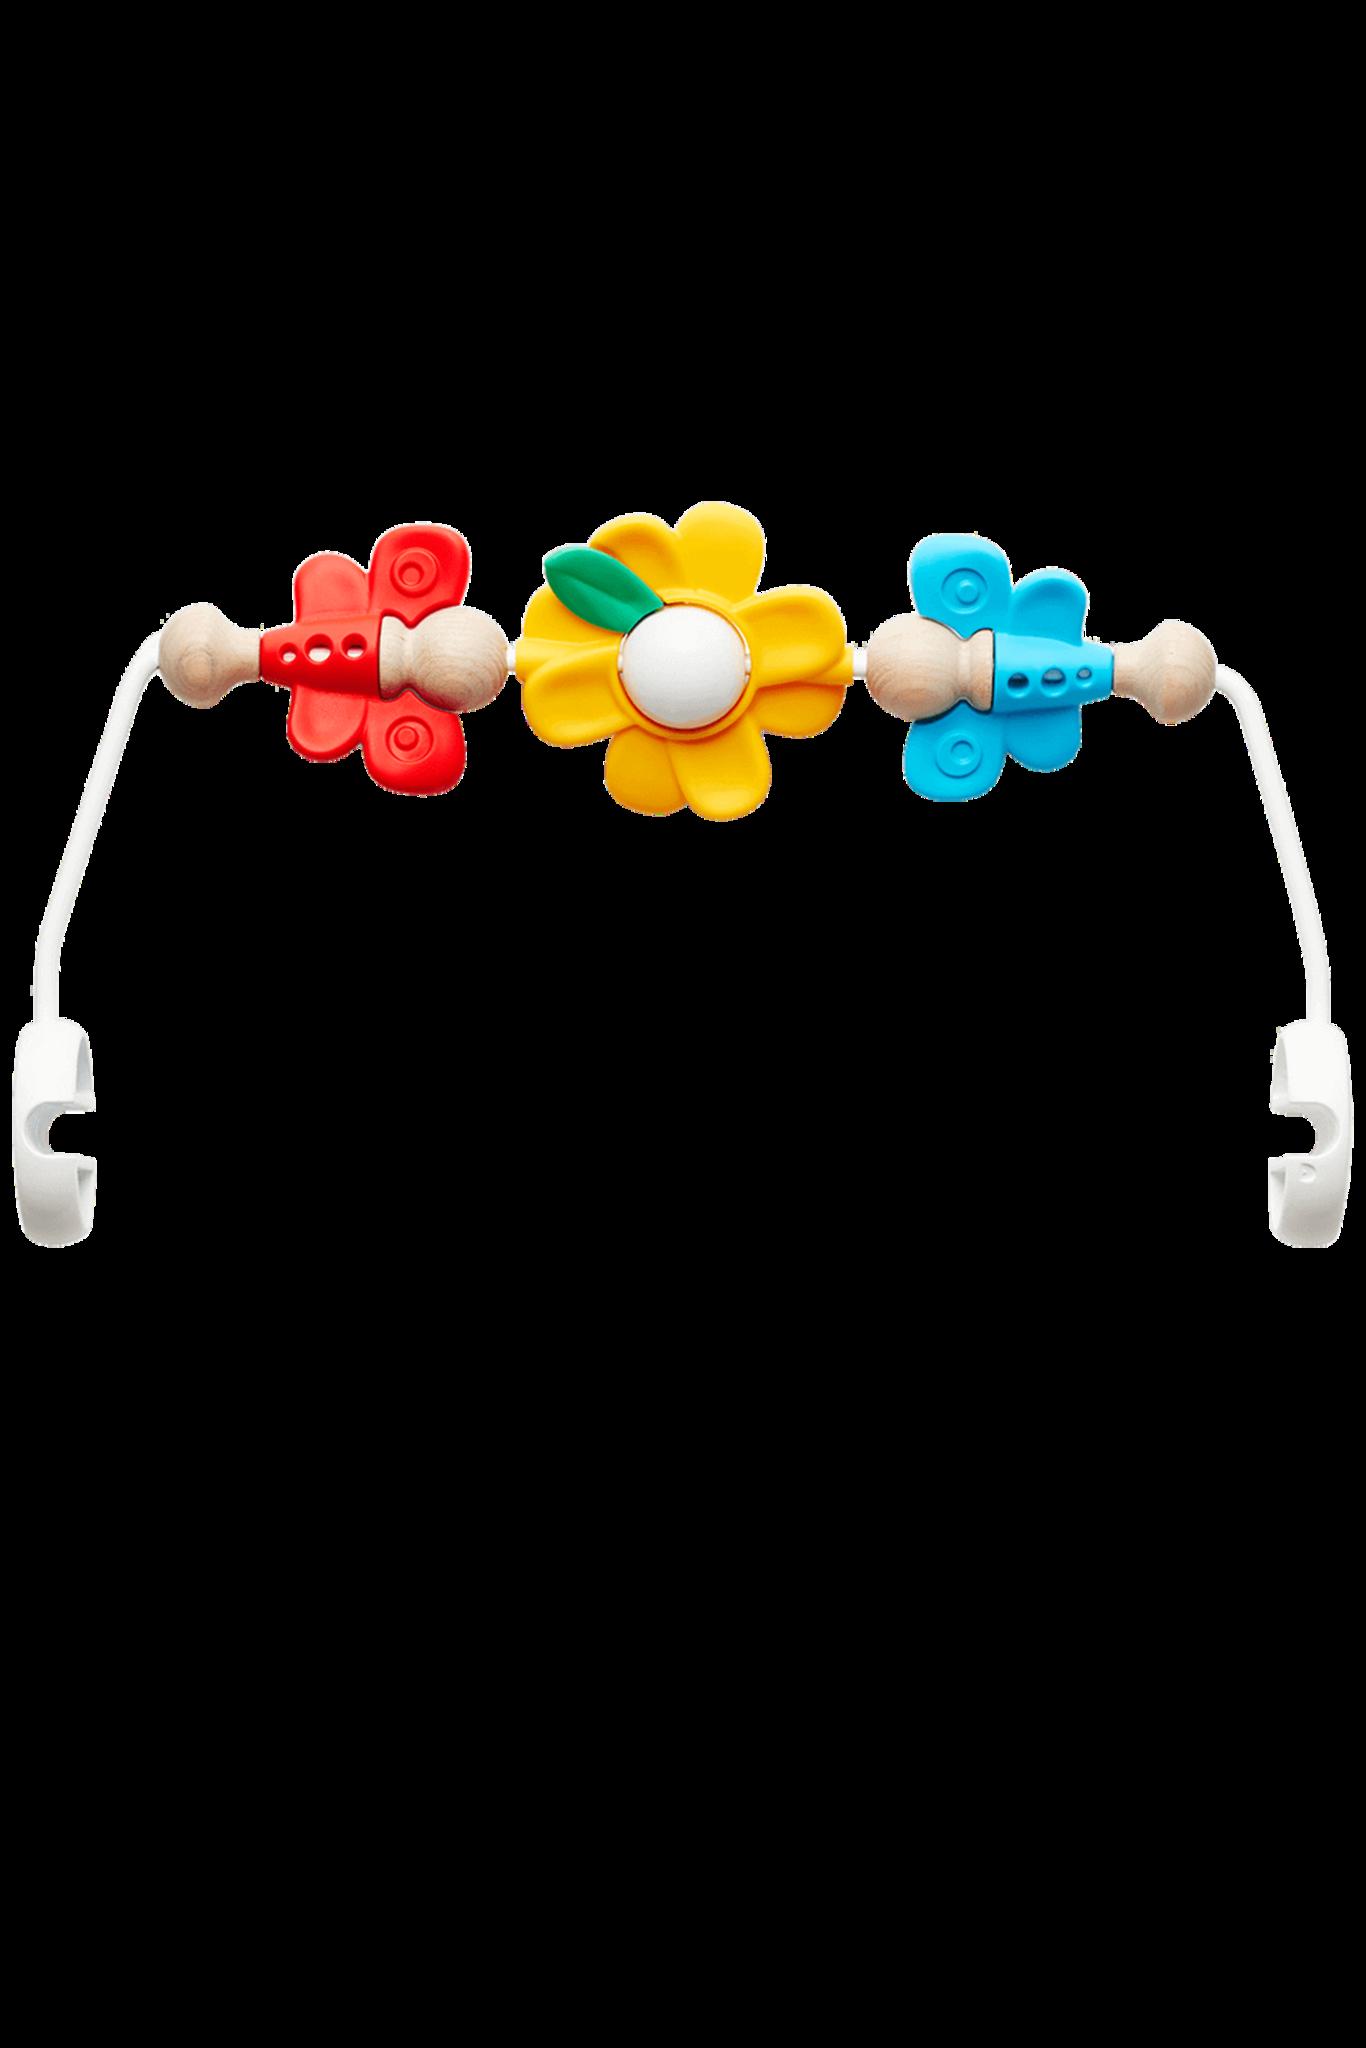 BABYBJÖRN BABYBJÖRN Spielzeug für Baby Bouncer Flying Friends